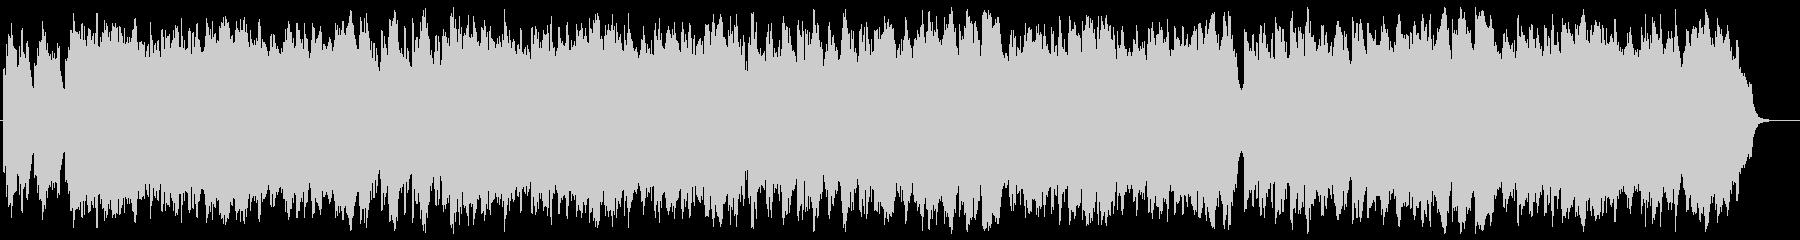 Wedding march (Mendelssohn)'s unreproduced waveform